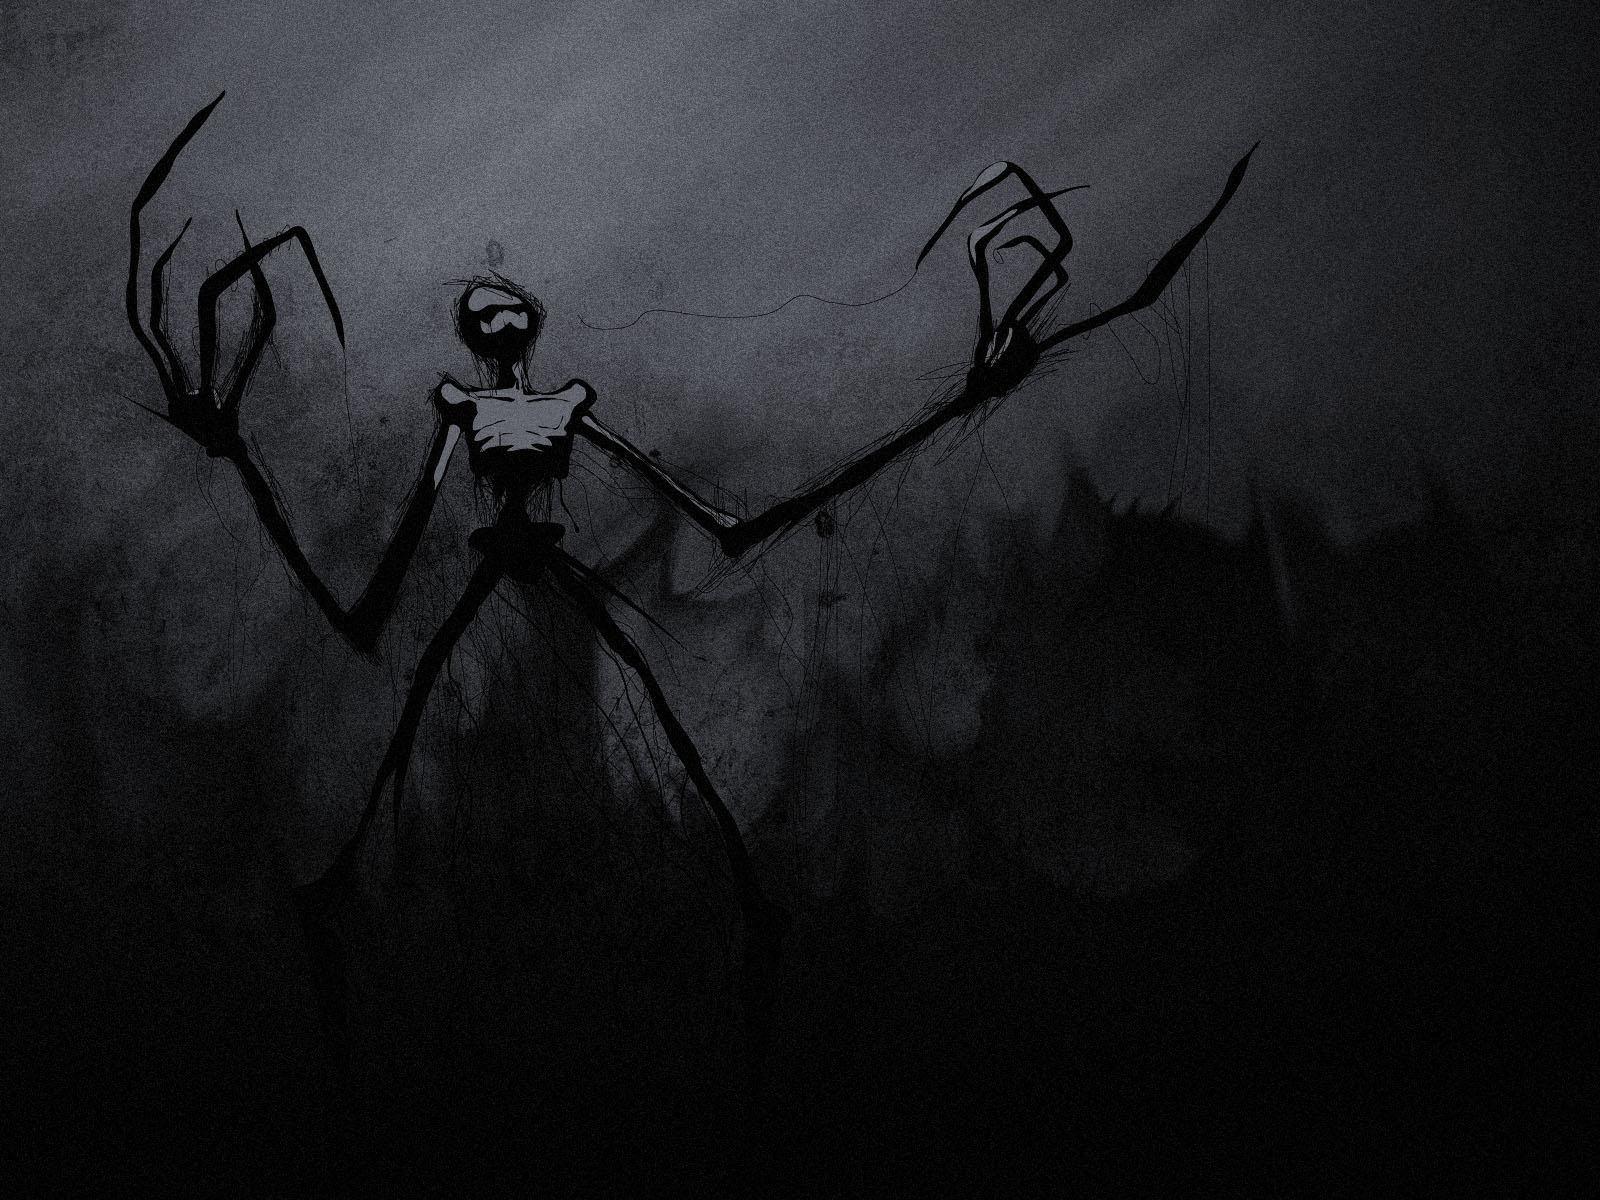 dark creepy Wallpaper Backgrounds